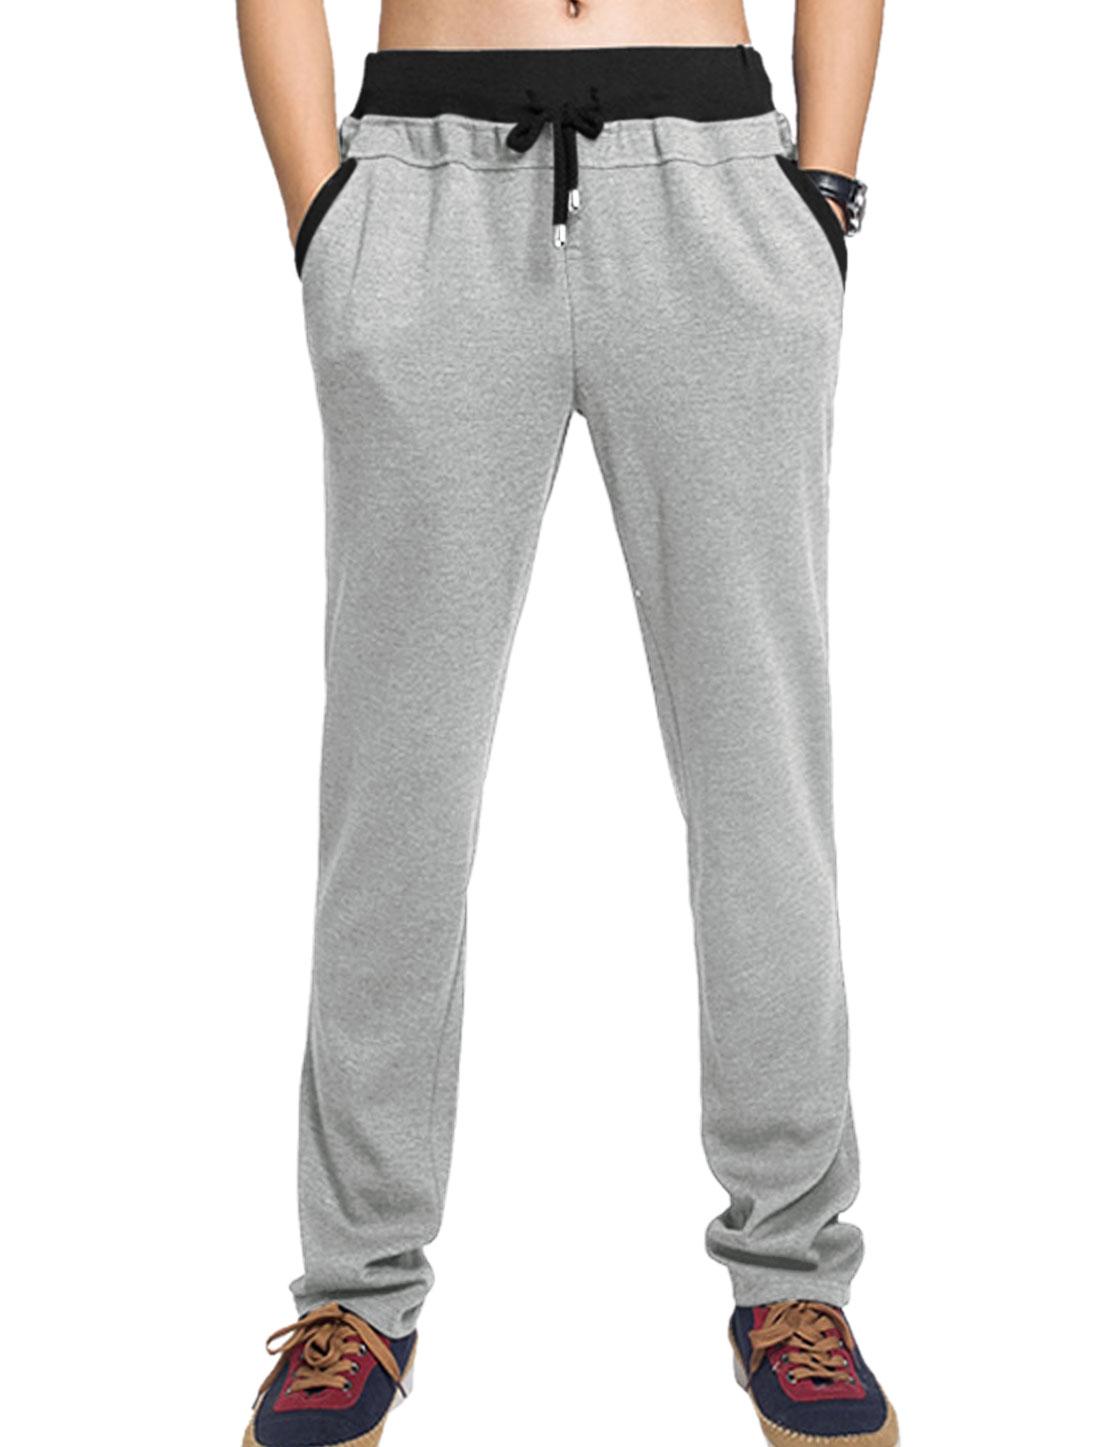 Men Drawcord Waist Unpatterned Casual Trousers Light Gray W34